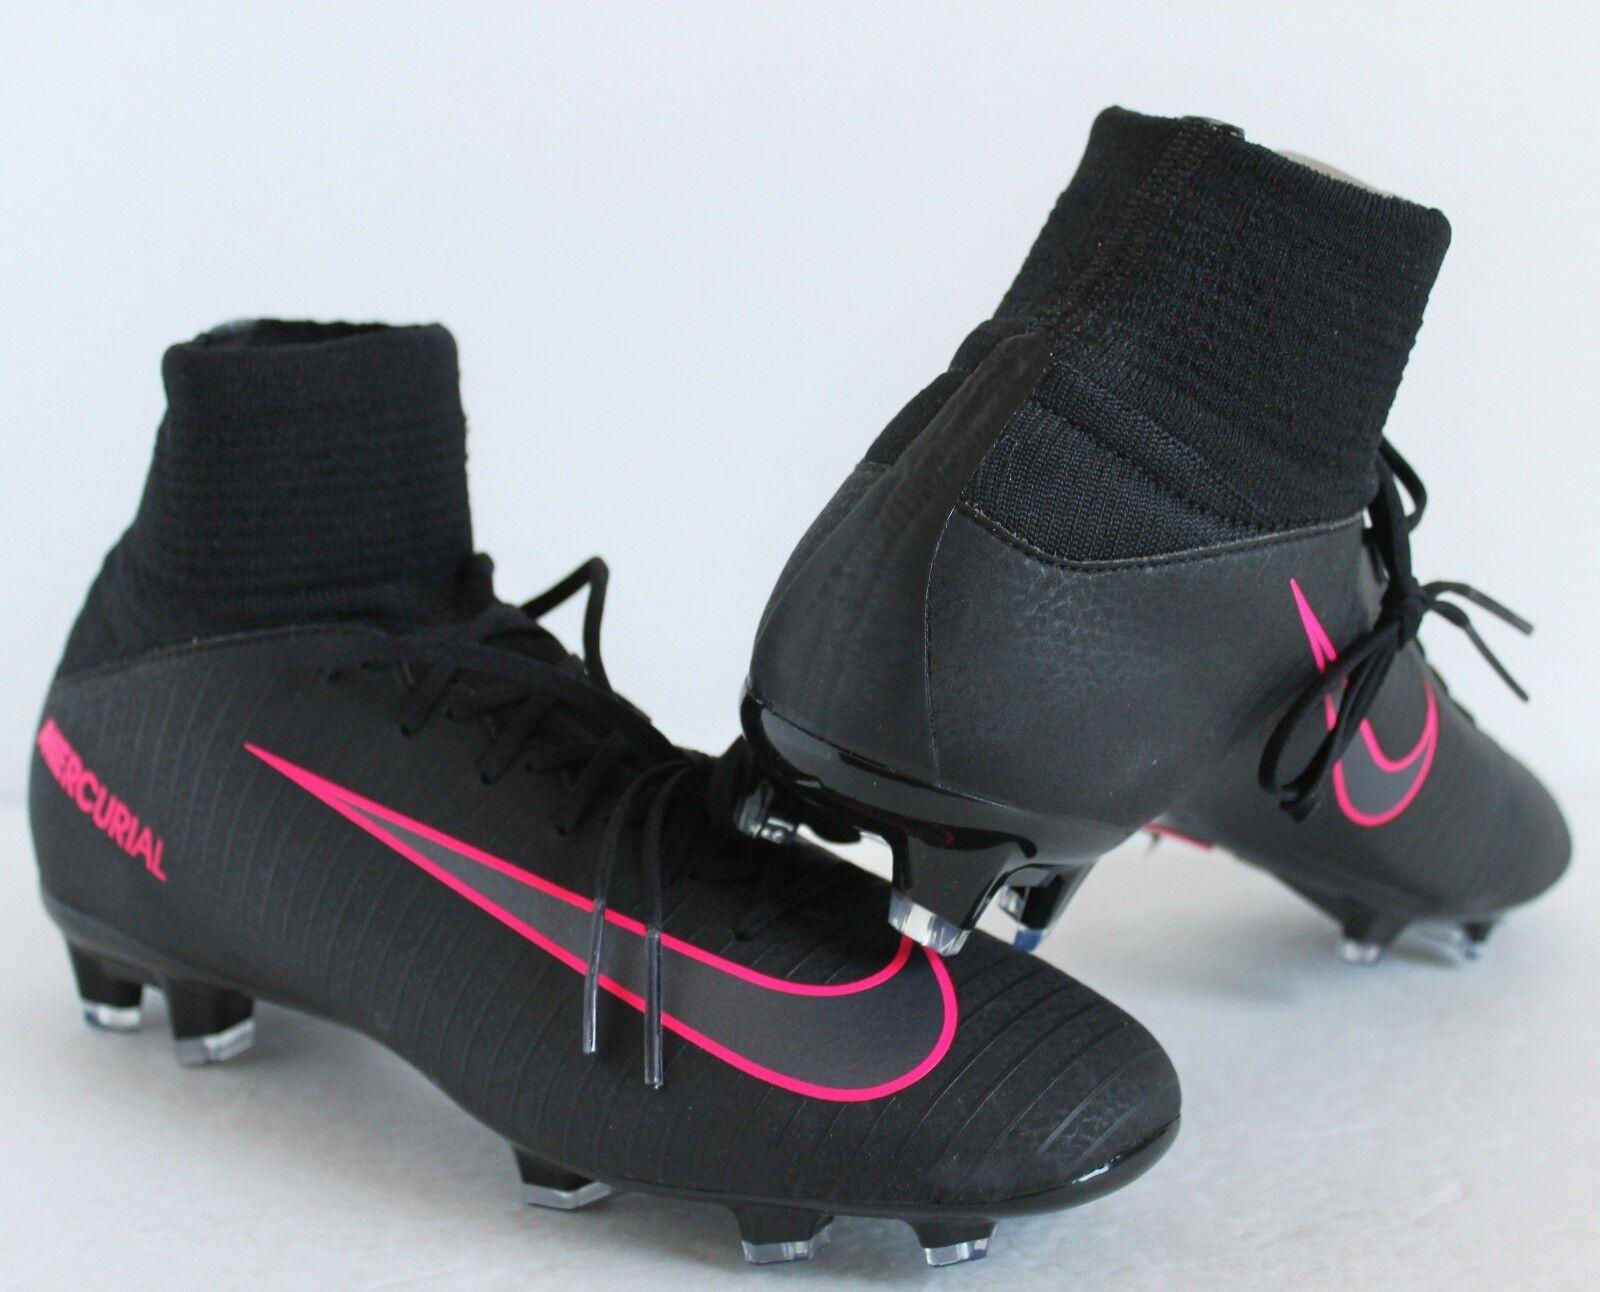 75925b8b6 Nike Jr. Mercurial Superfly V FG Soccer Cleats Size 4y Black Pink ...